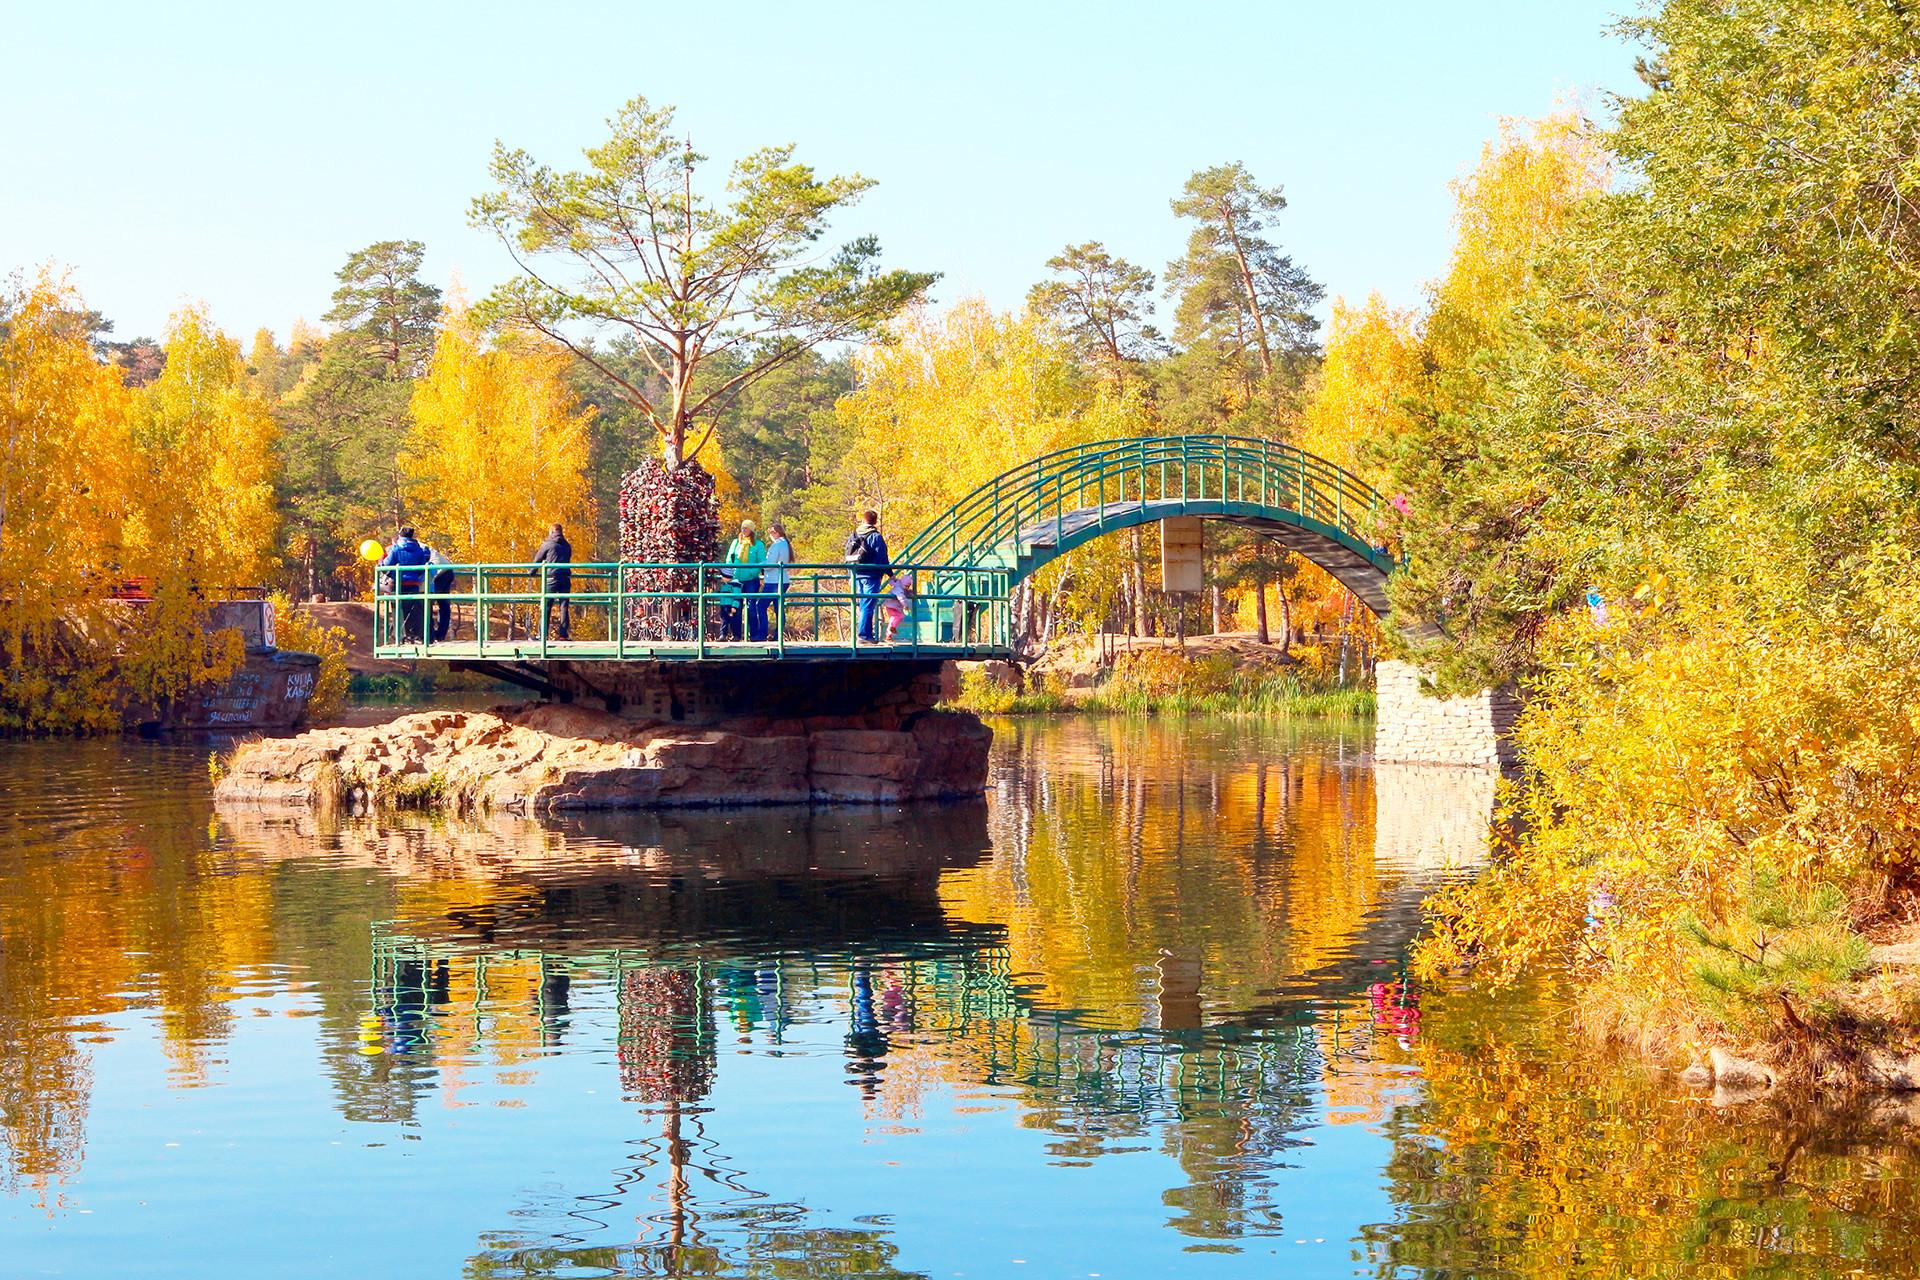 Ribnik v Parku Gagarina, osrednjem mestnem parku.